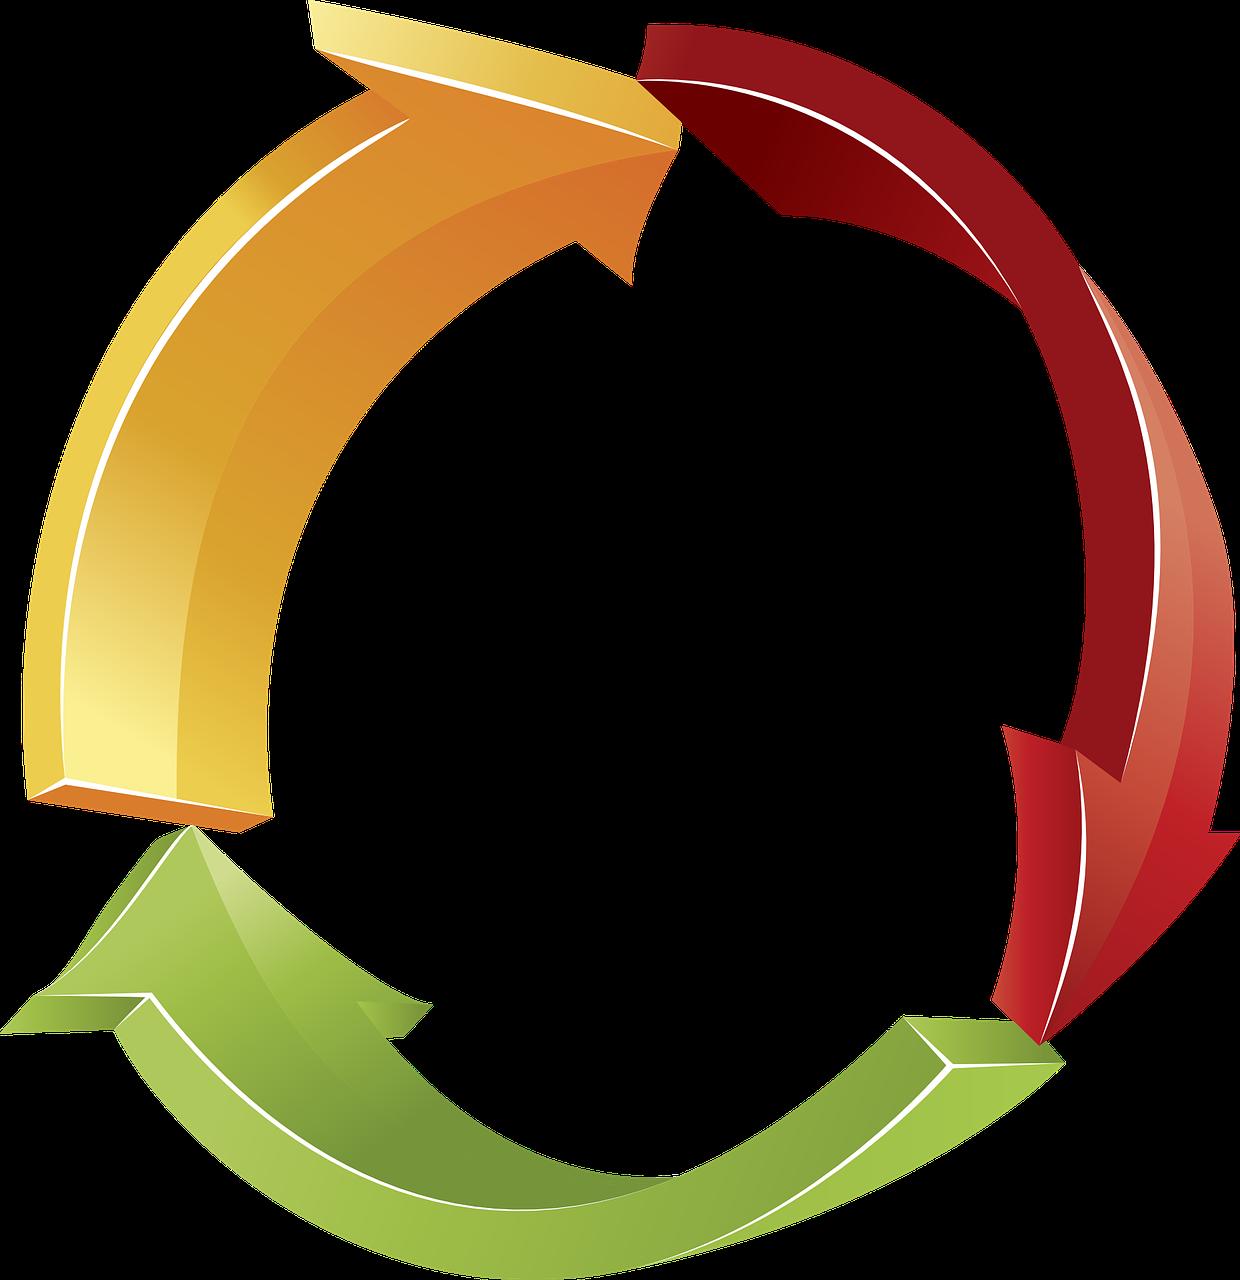 Feeder Matrix Team Build Rotator Circular Logo Symbols Cycle